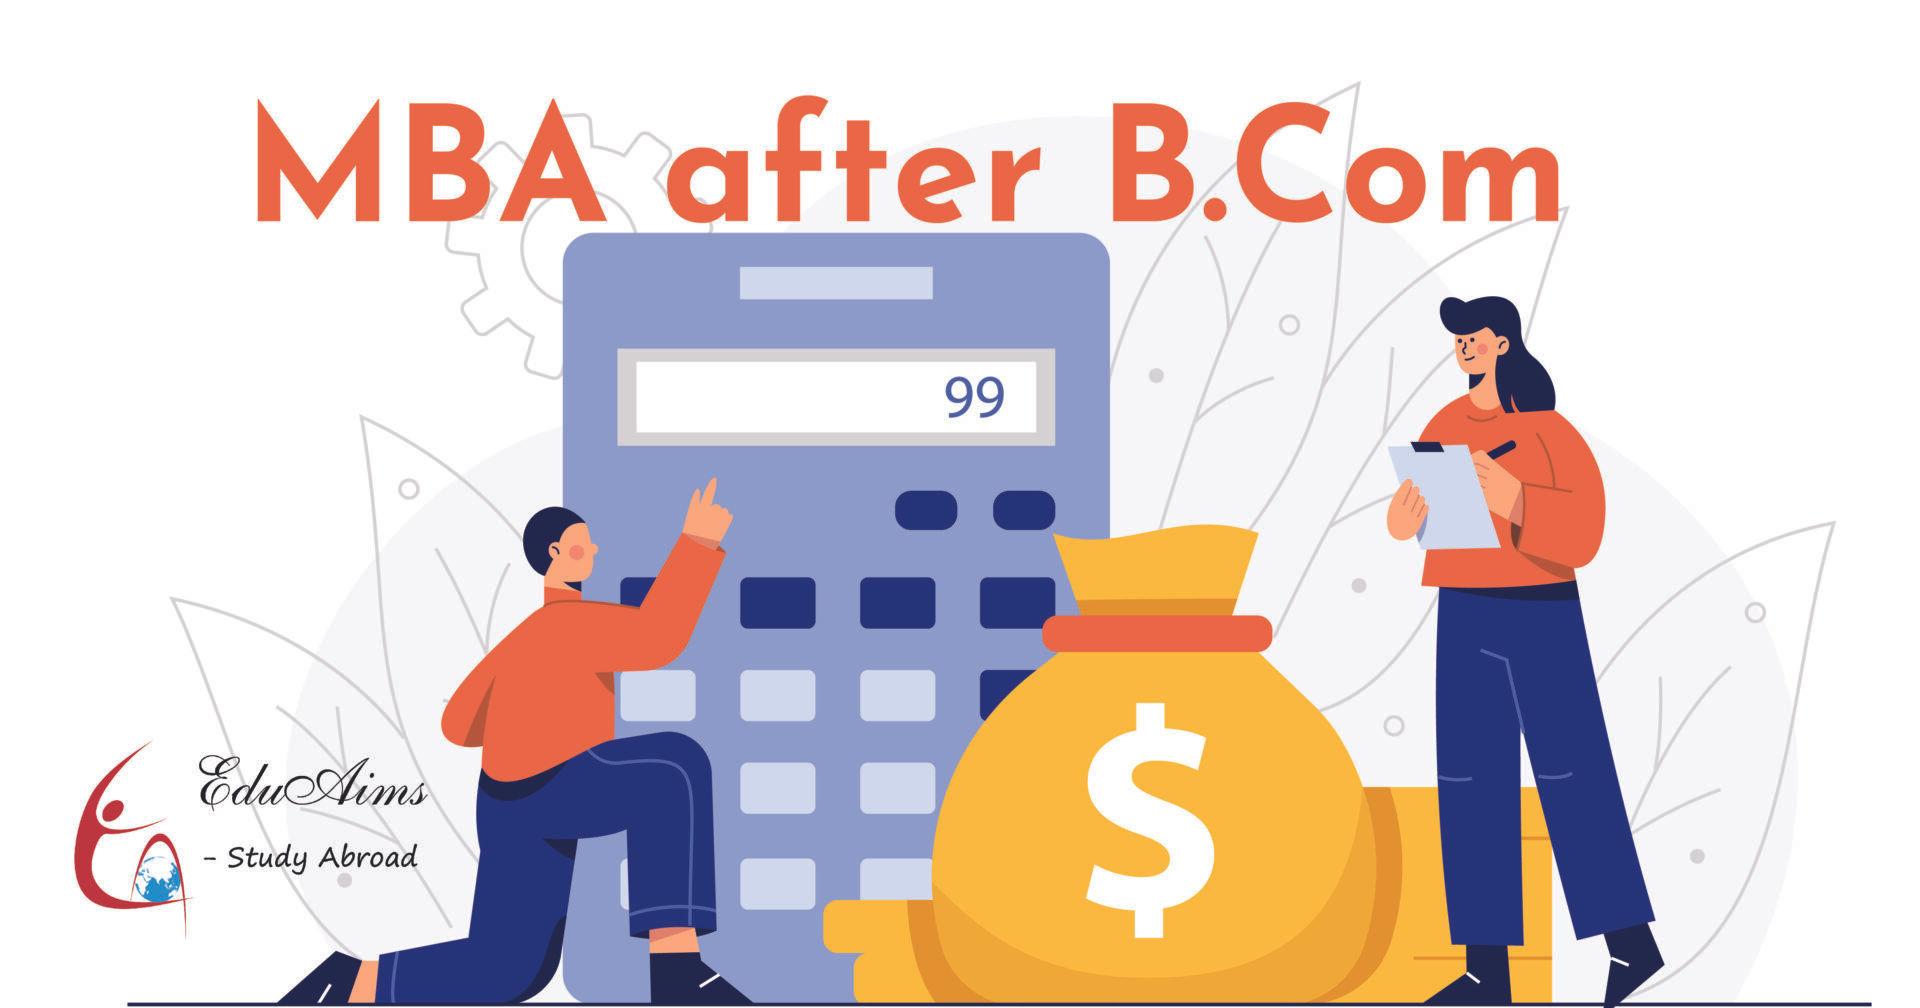 MBA after B.Com